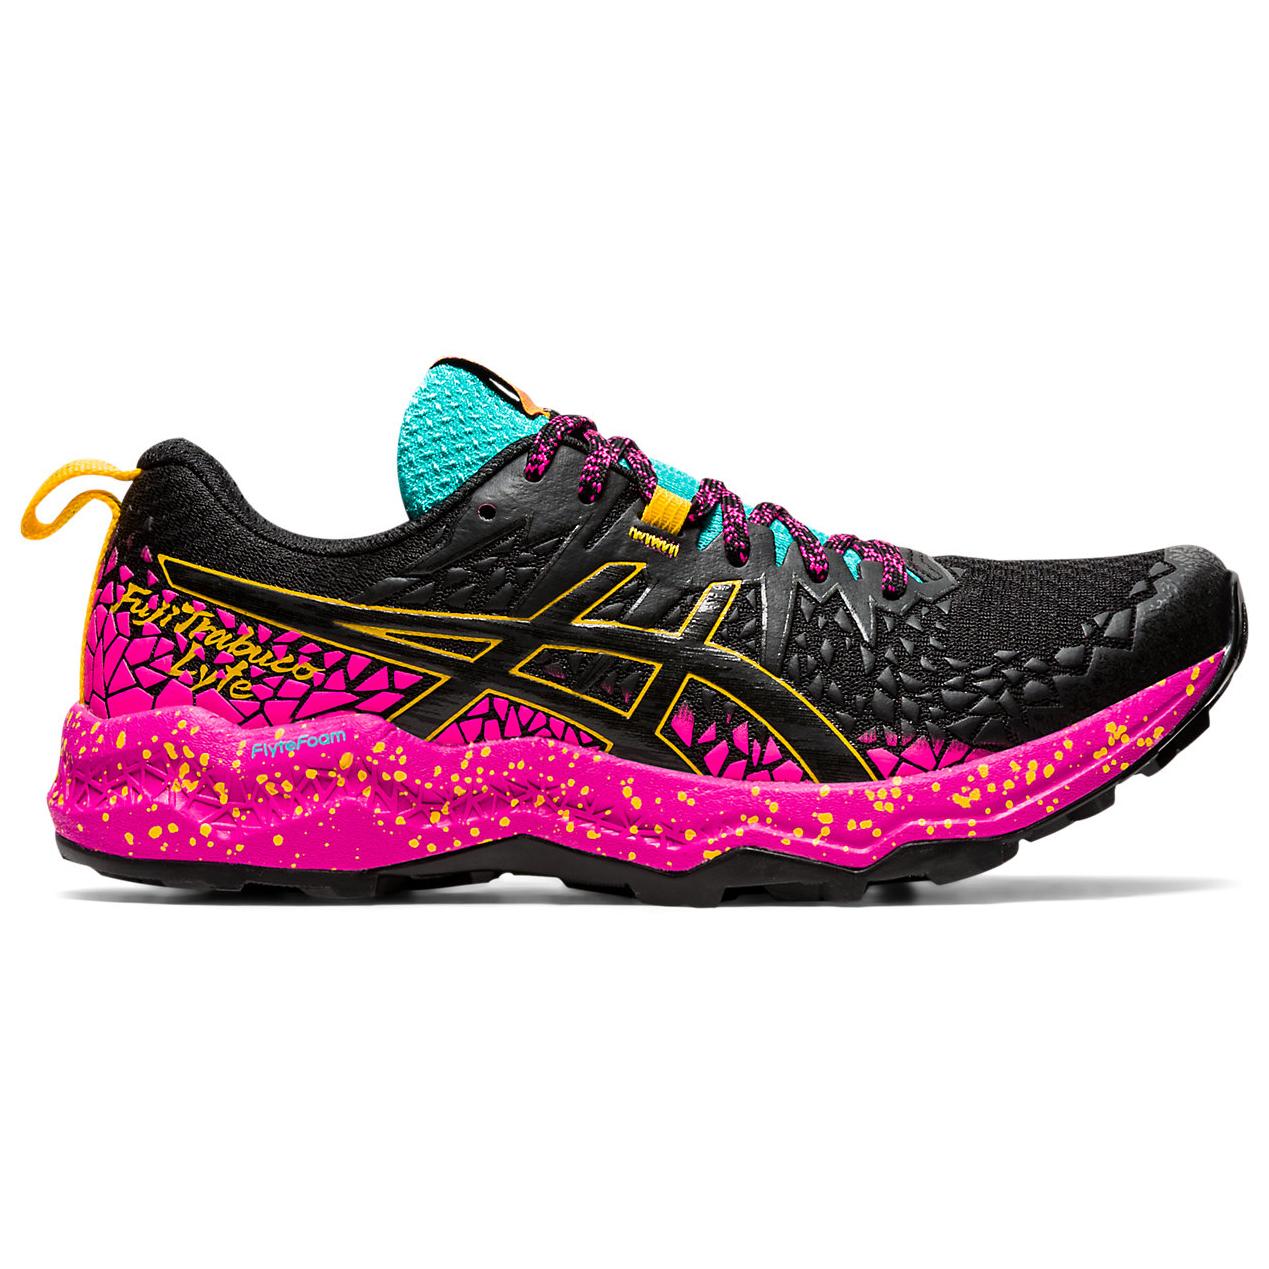 Asics - Women's FujiTrabuco Lyte - Trail running shoes - Black / Baltic Jewel | 5,5 (US)